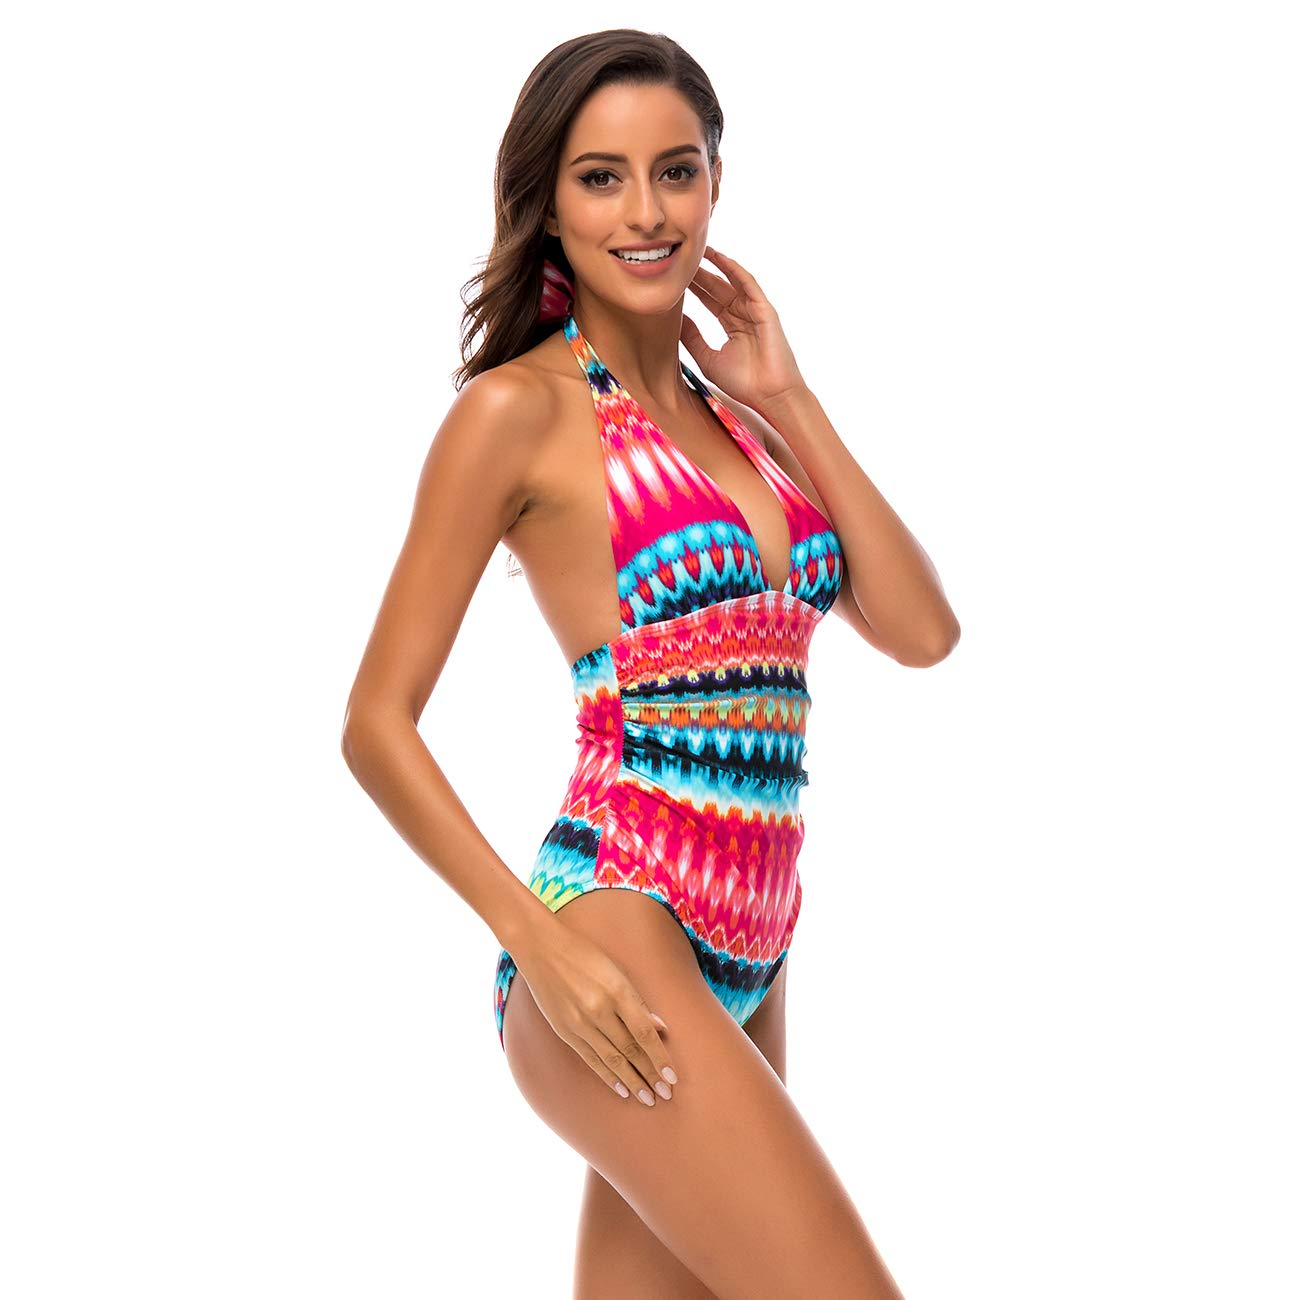 S-XXL DAYU Womens Deep V-Neck One Piece Swimsuit Halter Backless Monokini Bathing Suit